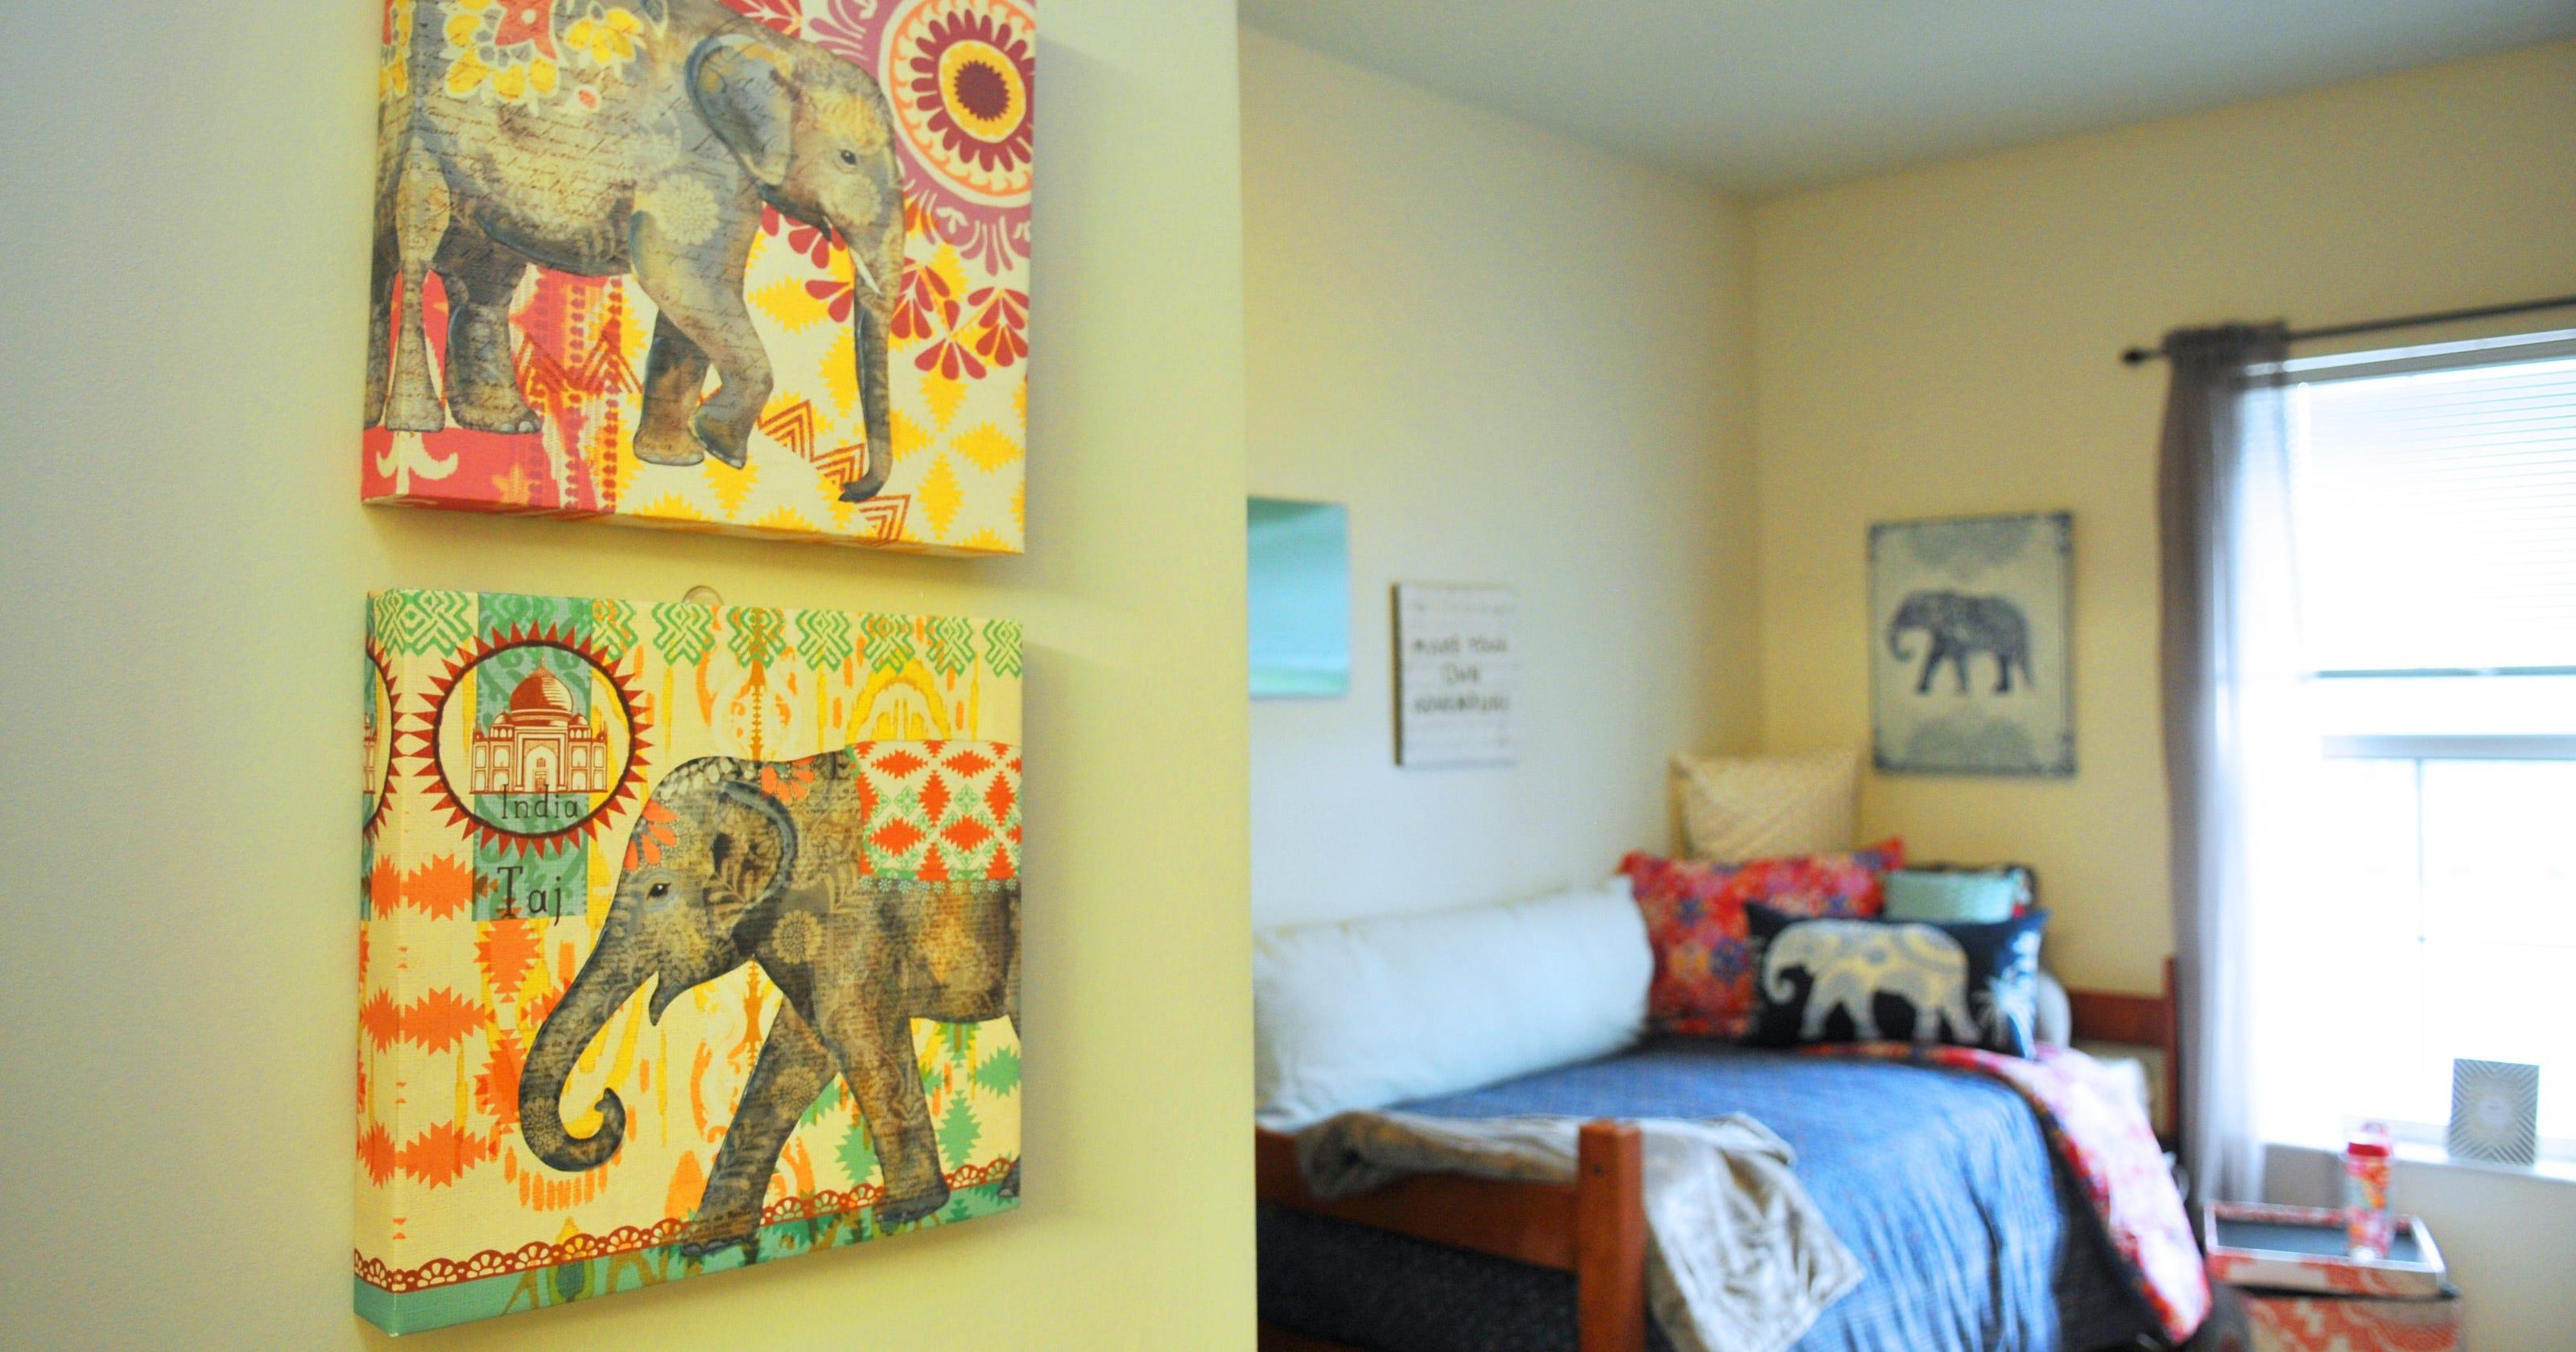 Florida Tech dorm gets Bed Bath & Beyond makeover